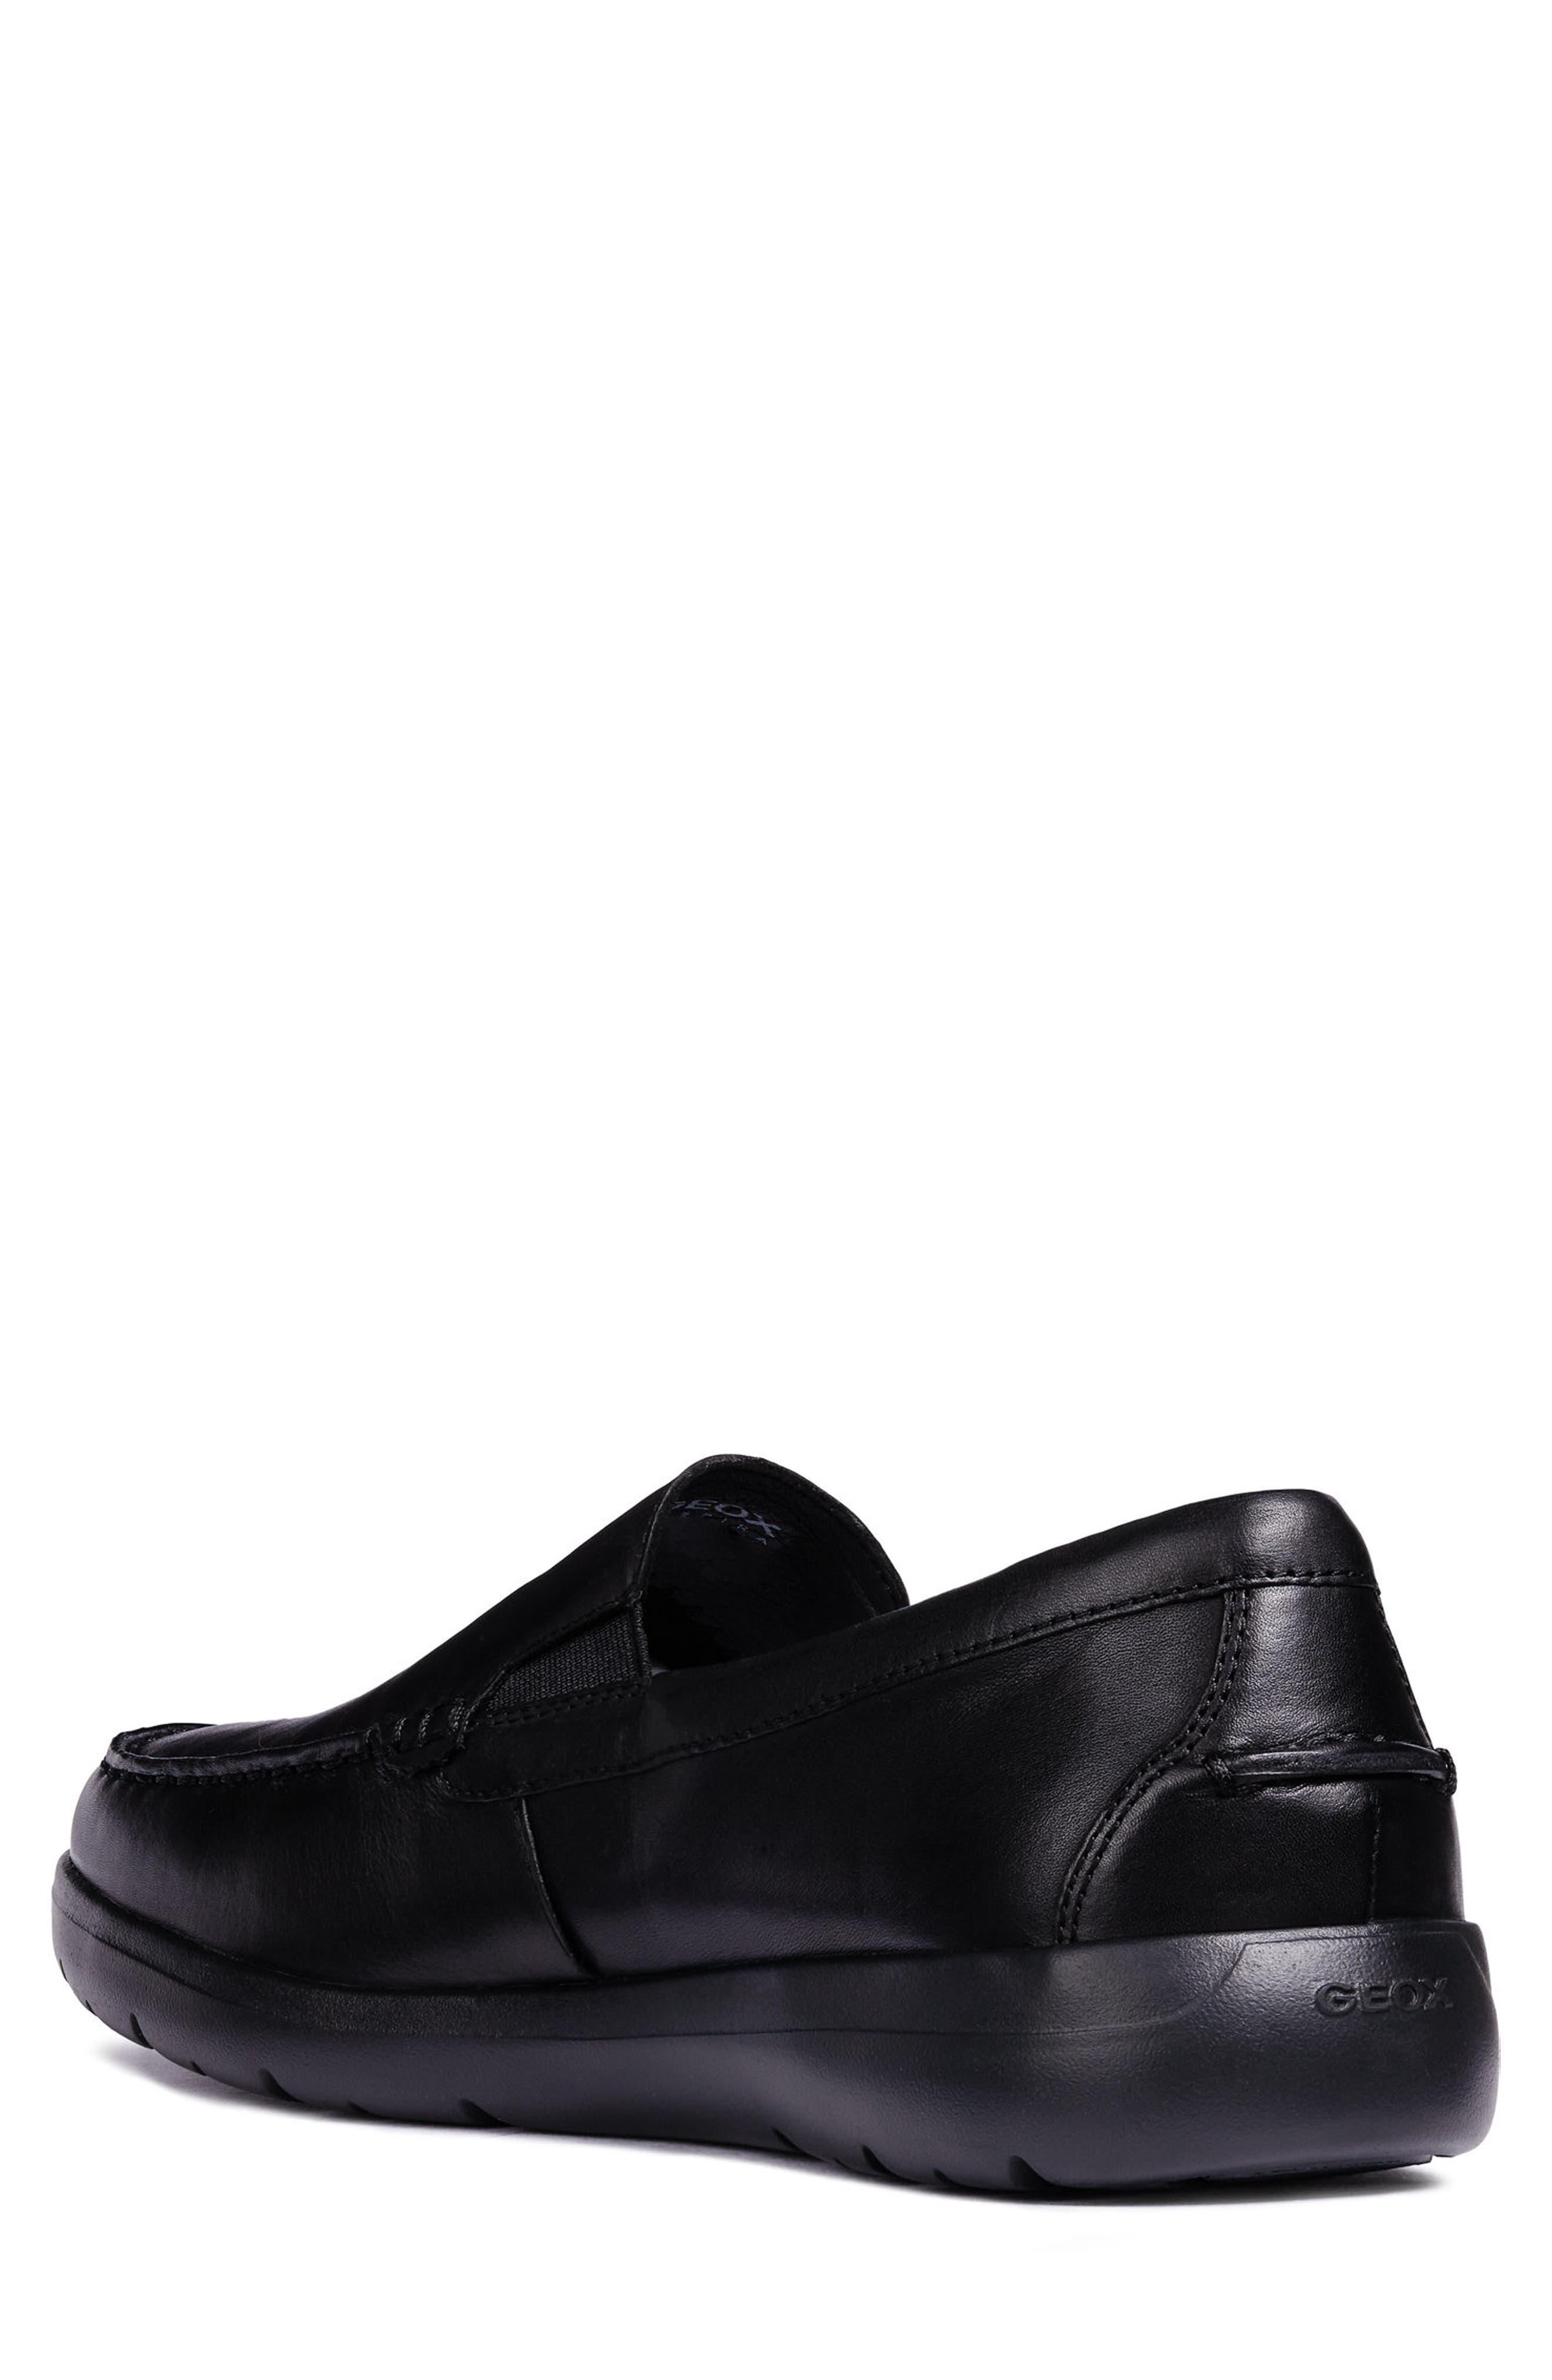 Leitan 6 Moc Toe Slip-On,                             Alternate thumbnail 2, color,                             BLACK LEATHER